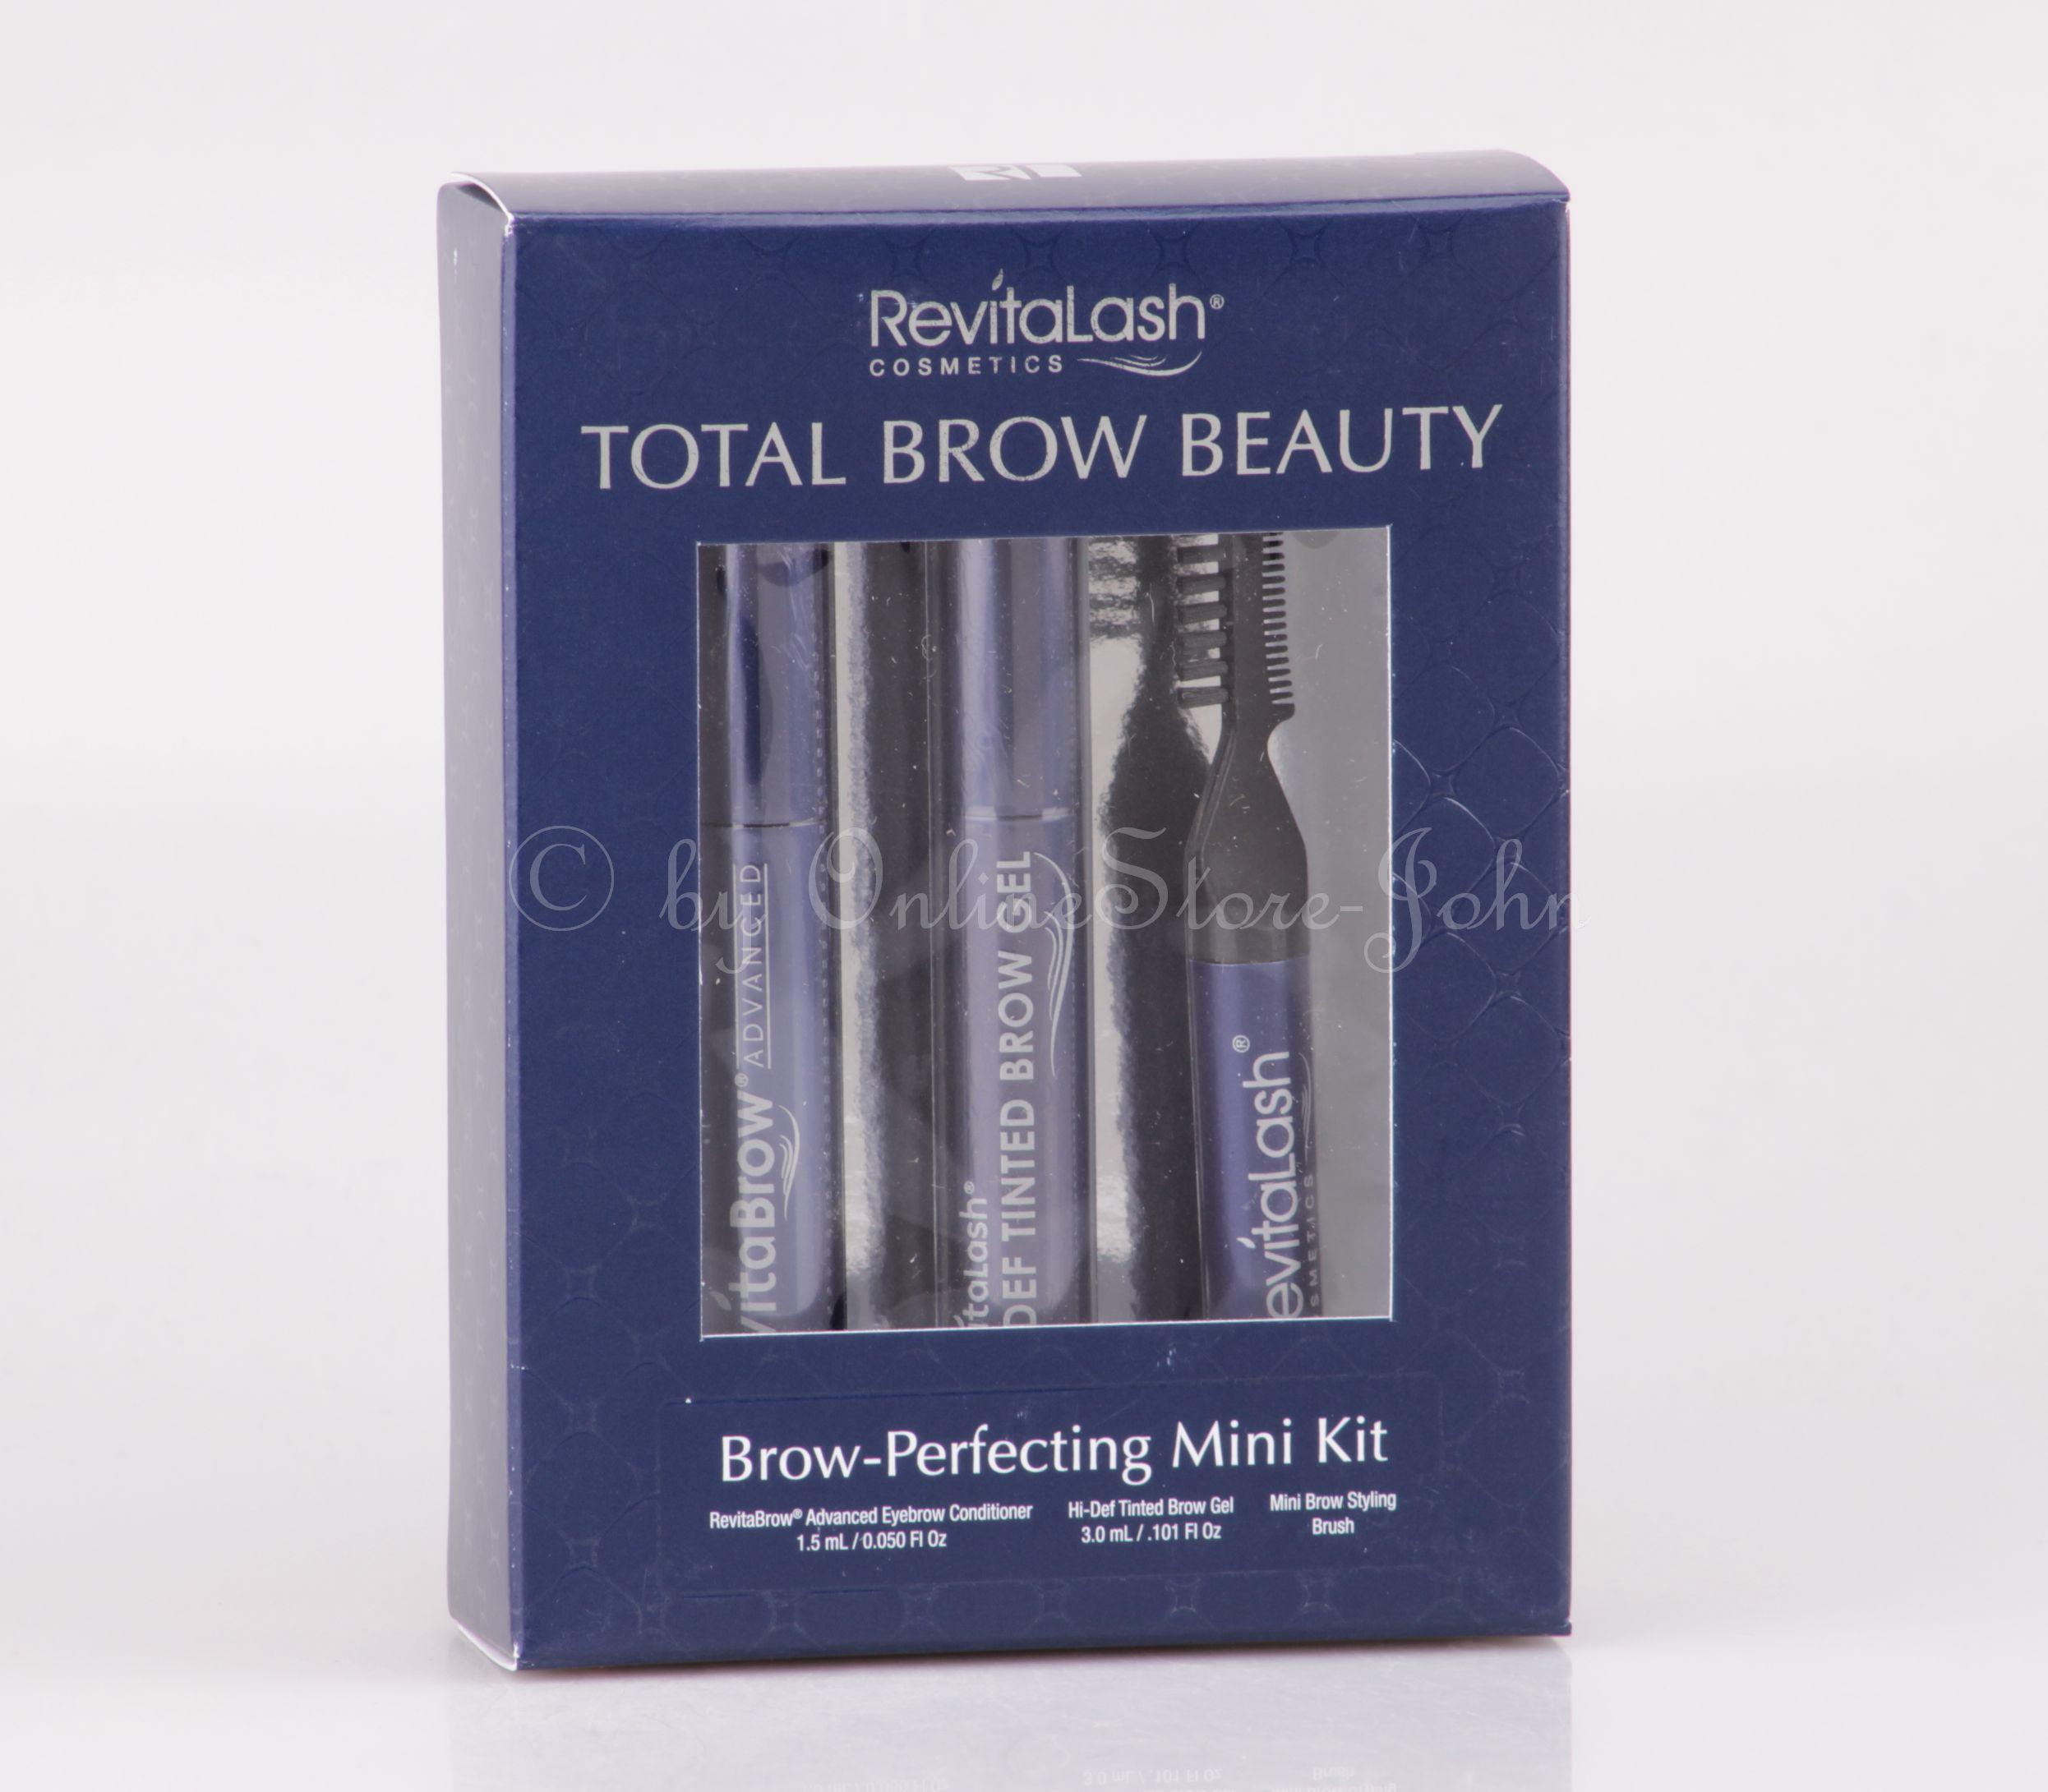 c9d094a367d RevitaLash - Total Brow Beauty - Perfecting Mini Kit incl. 0.0507oz  Revitabrow